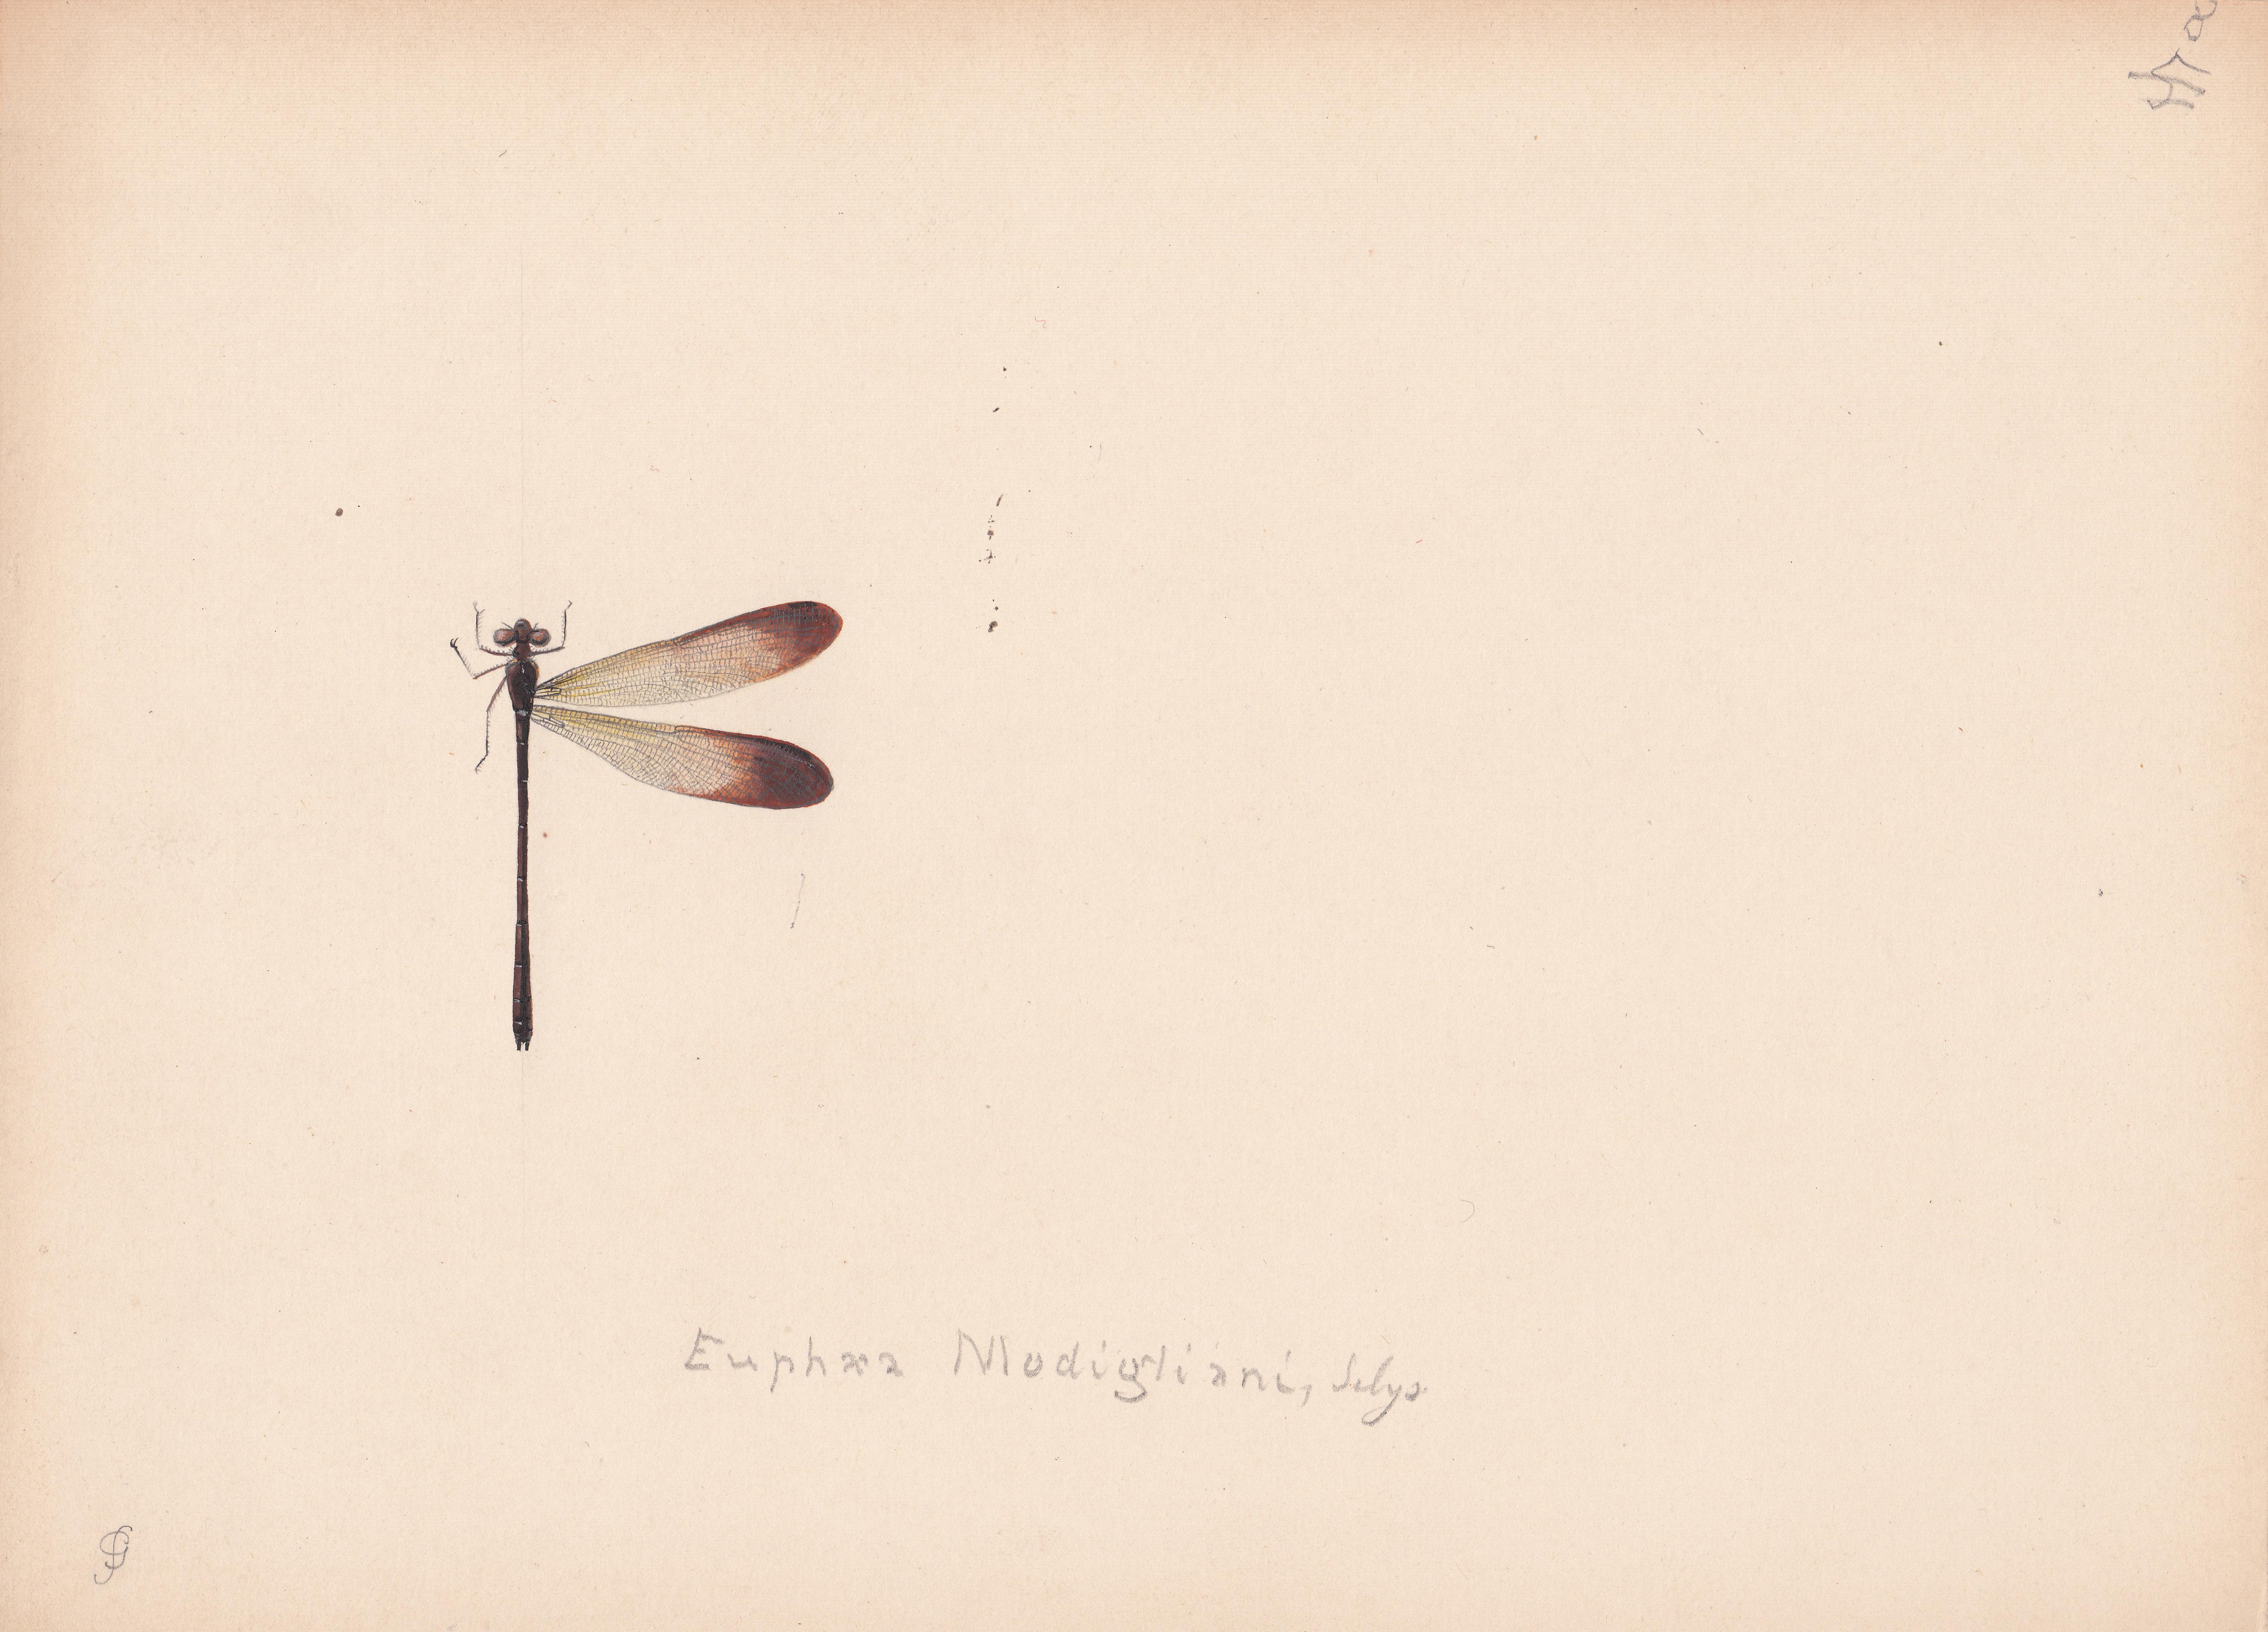 Euphaea modigliani.jpg